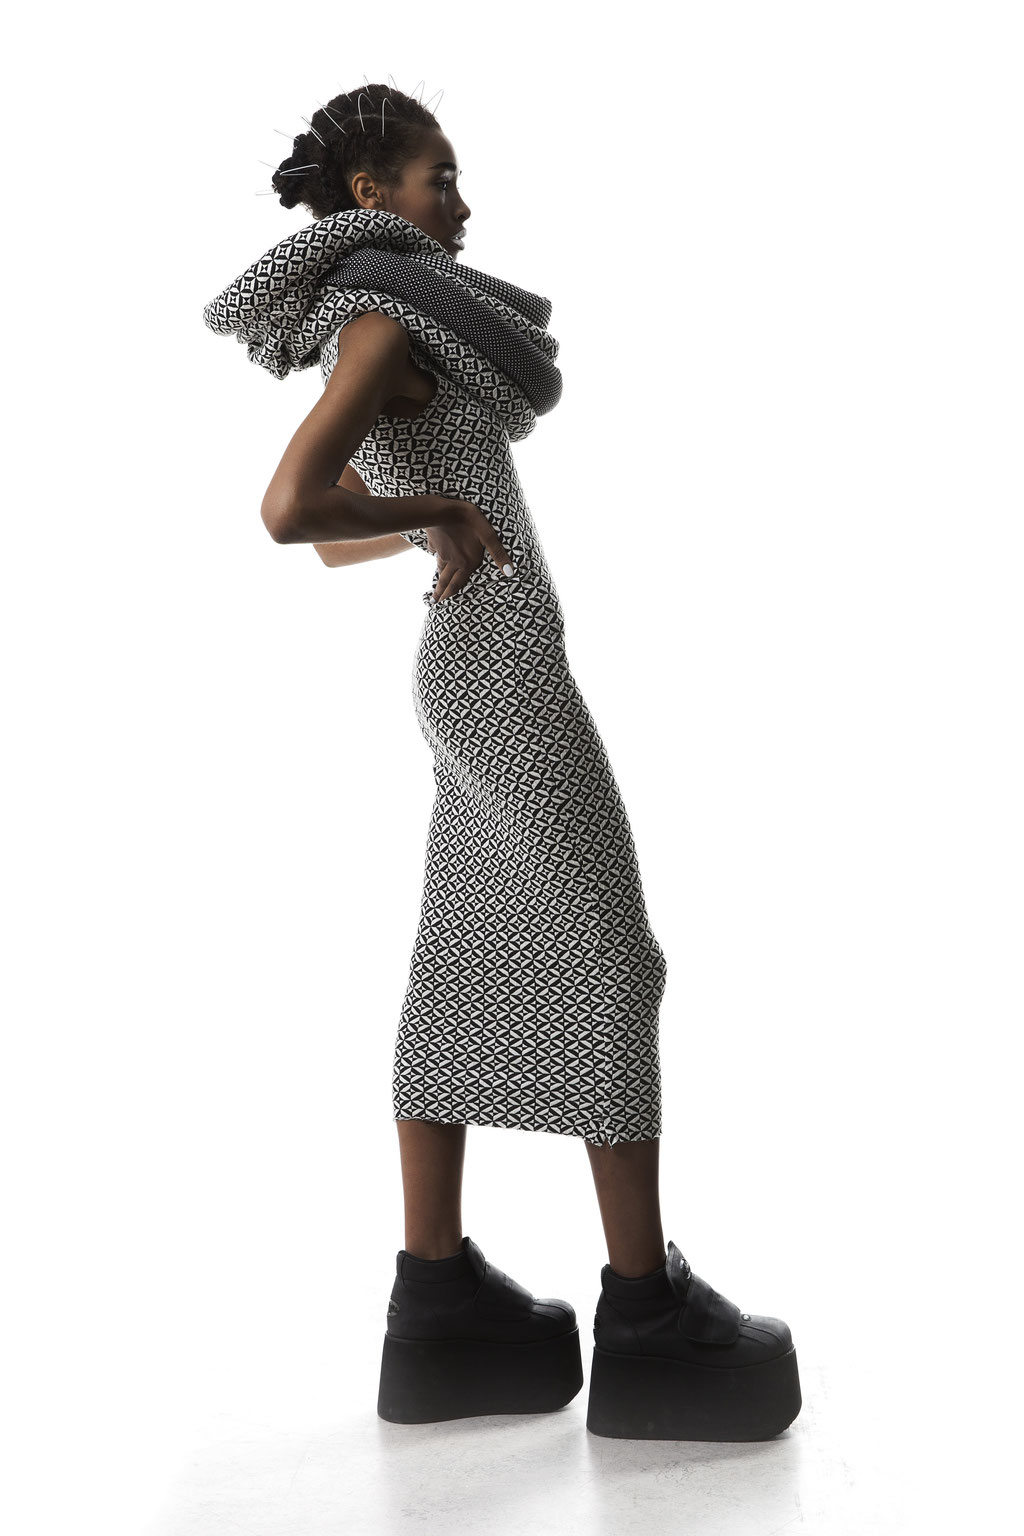 Photo: Cyrano Bentlage // Model: Maria Susan Landwehr // Fashion: Vky Nguyen